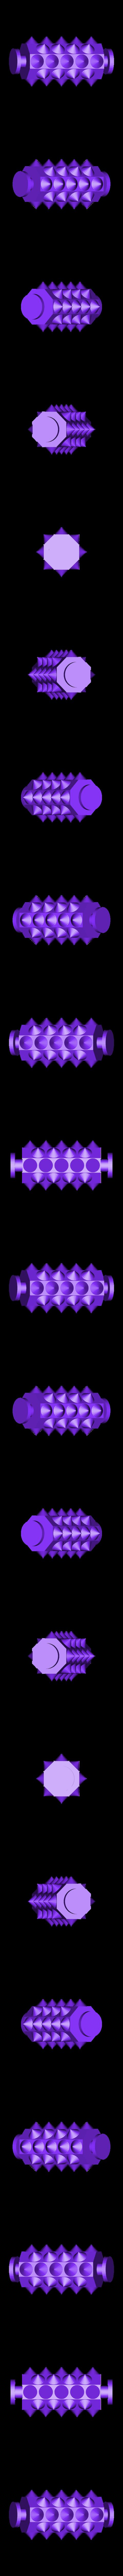 mas_b.stl Download free STL file Massage tool (+v2) • 3D printing design, kpawel